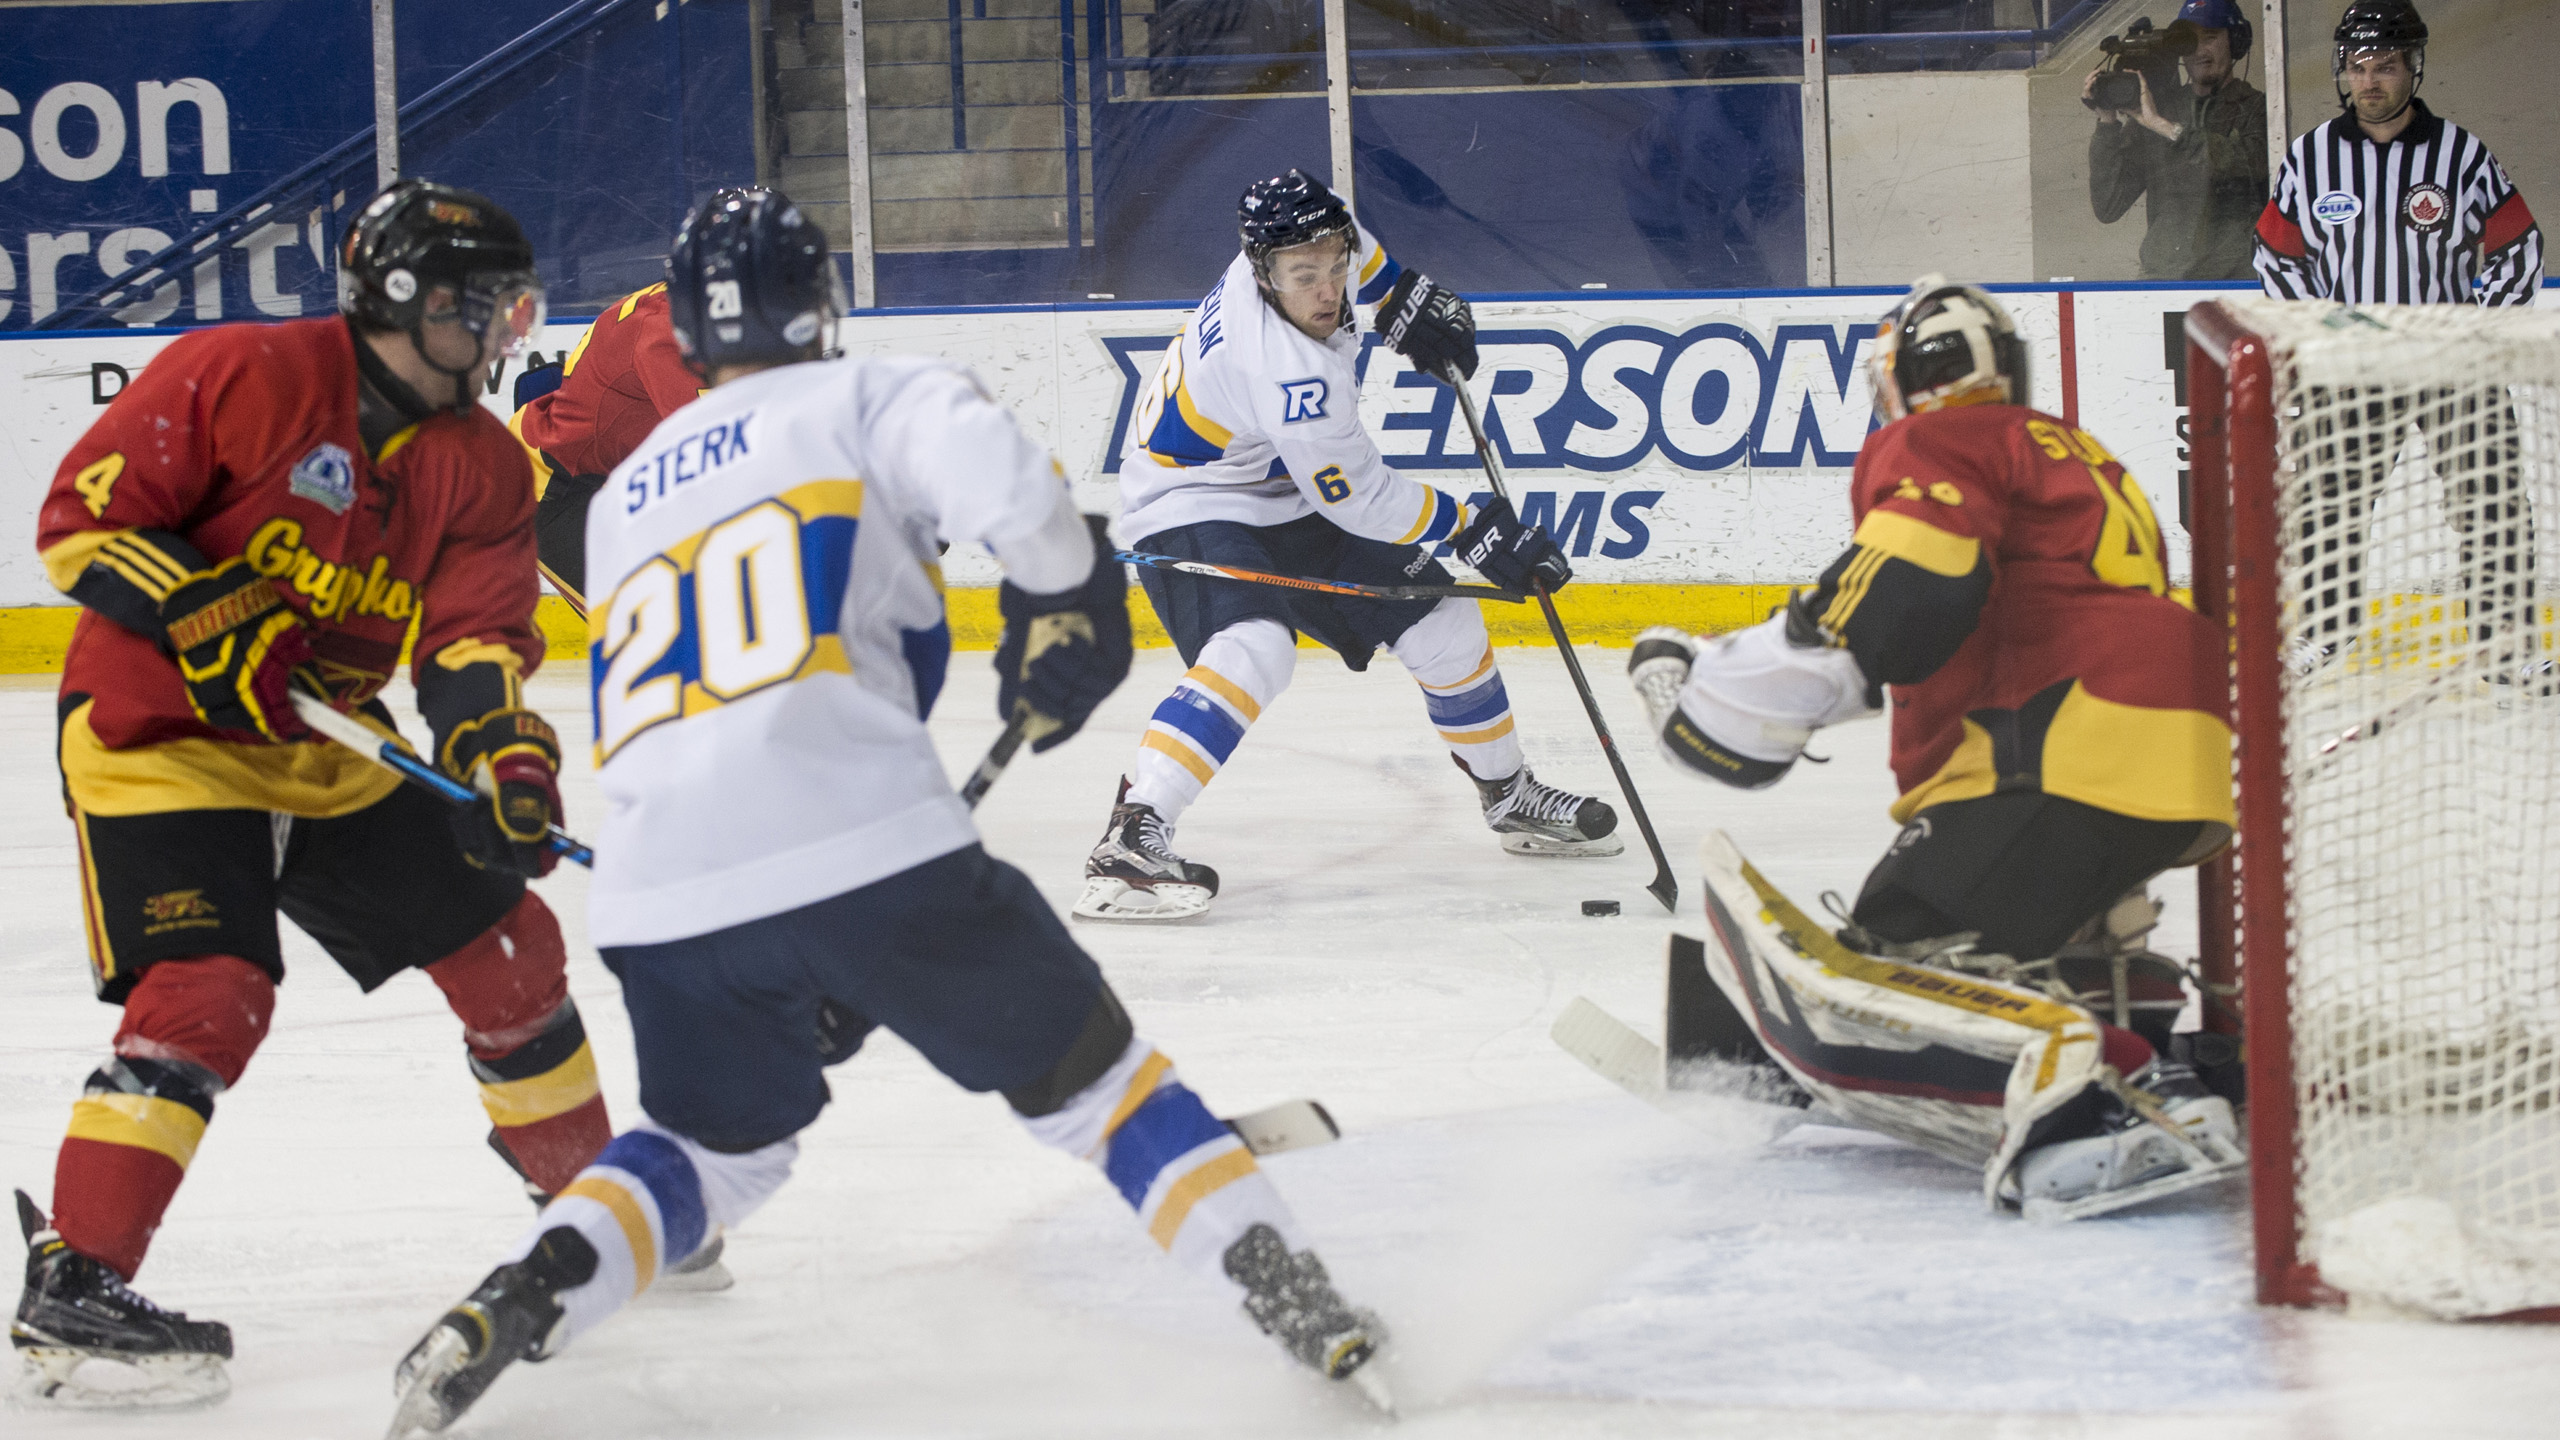 MensHockey6_Feb7_AndrejIvanov